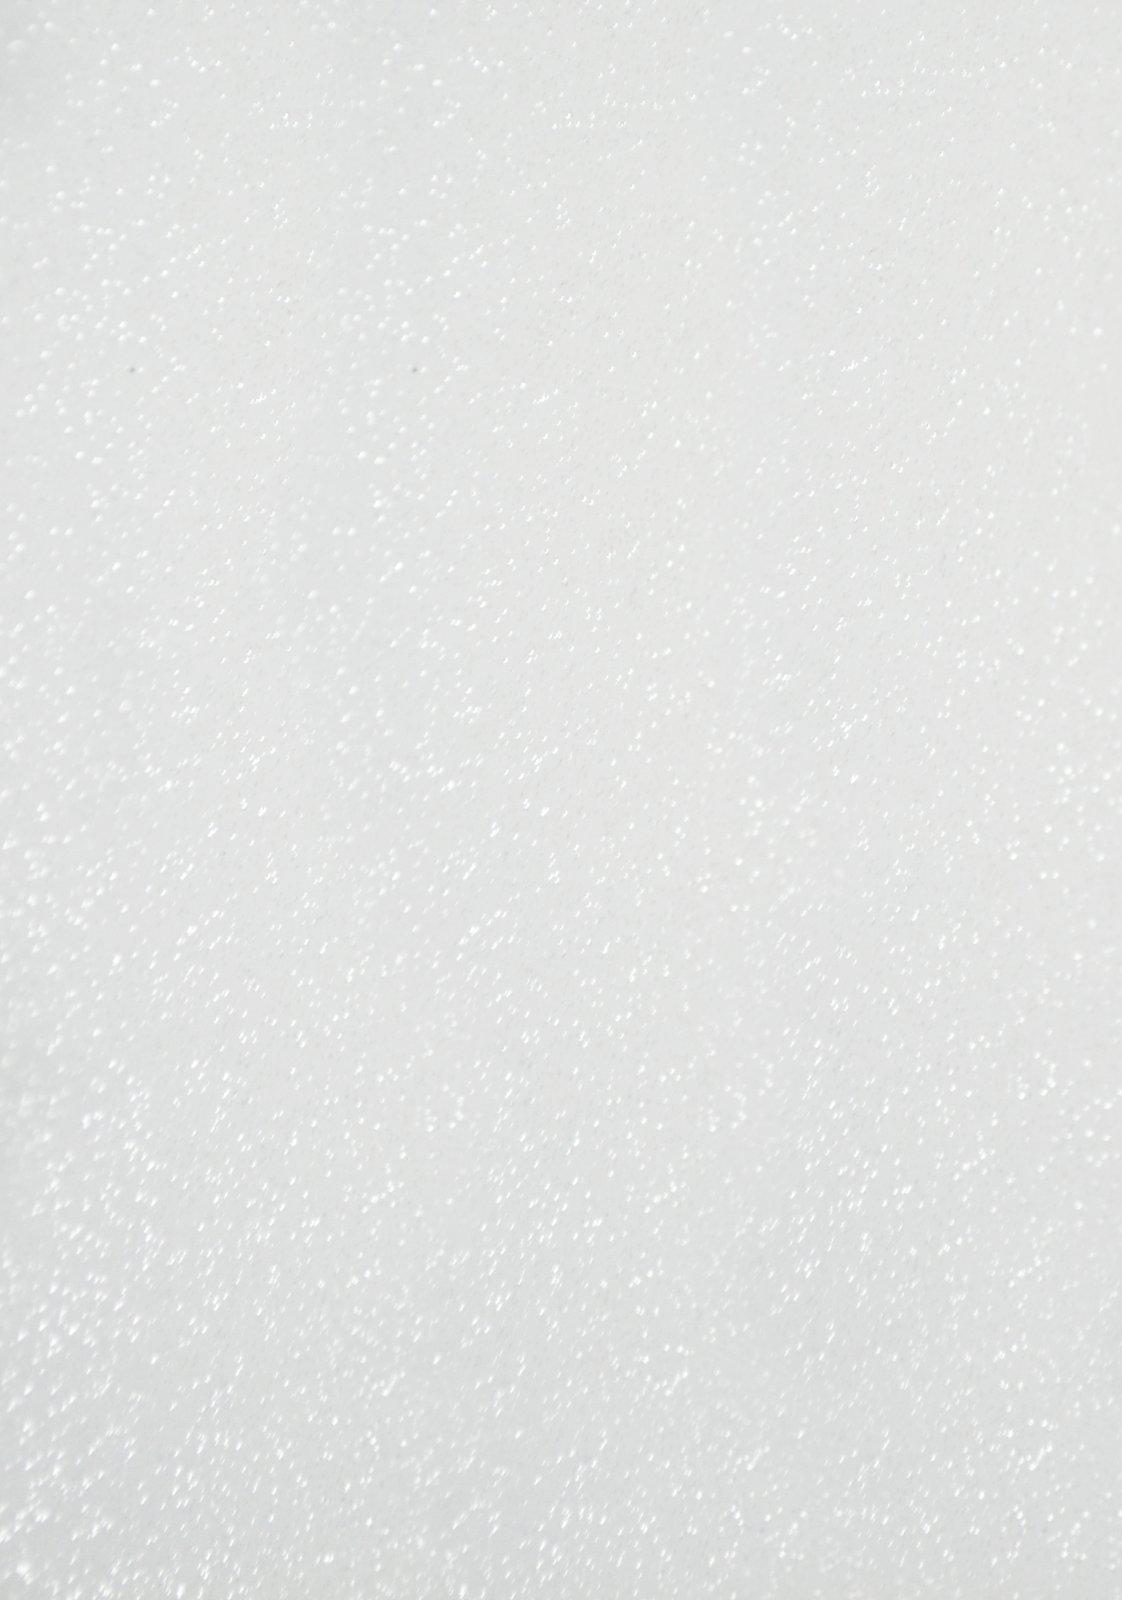 Пленка ПВХ Галактика белая